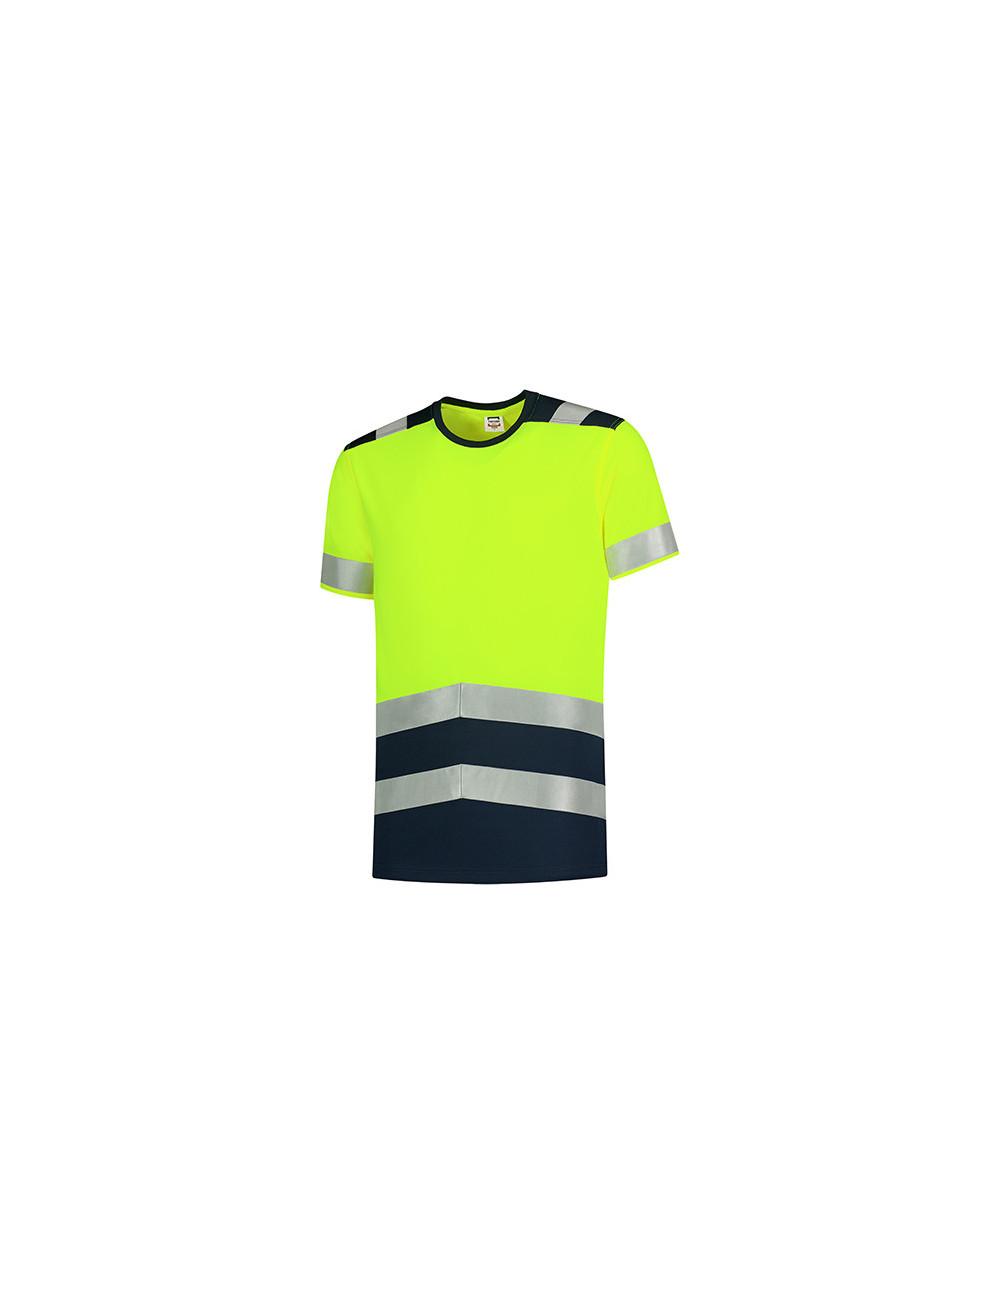 Adler TRICORP Koszulka unisex T-Shirt High Vis Bicolor T01 fluorescencyjny żółty